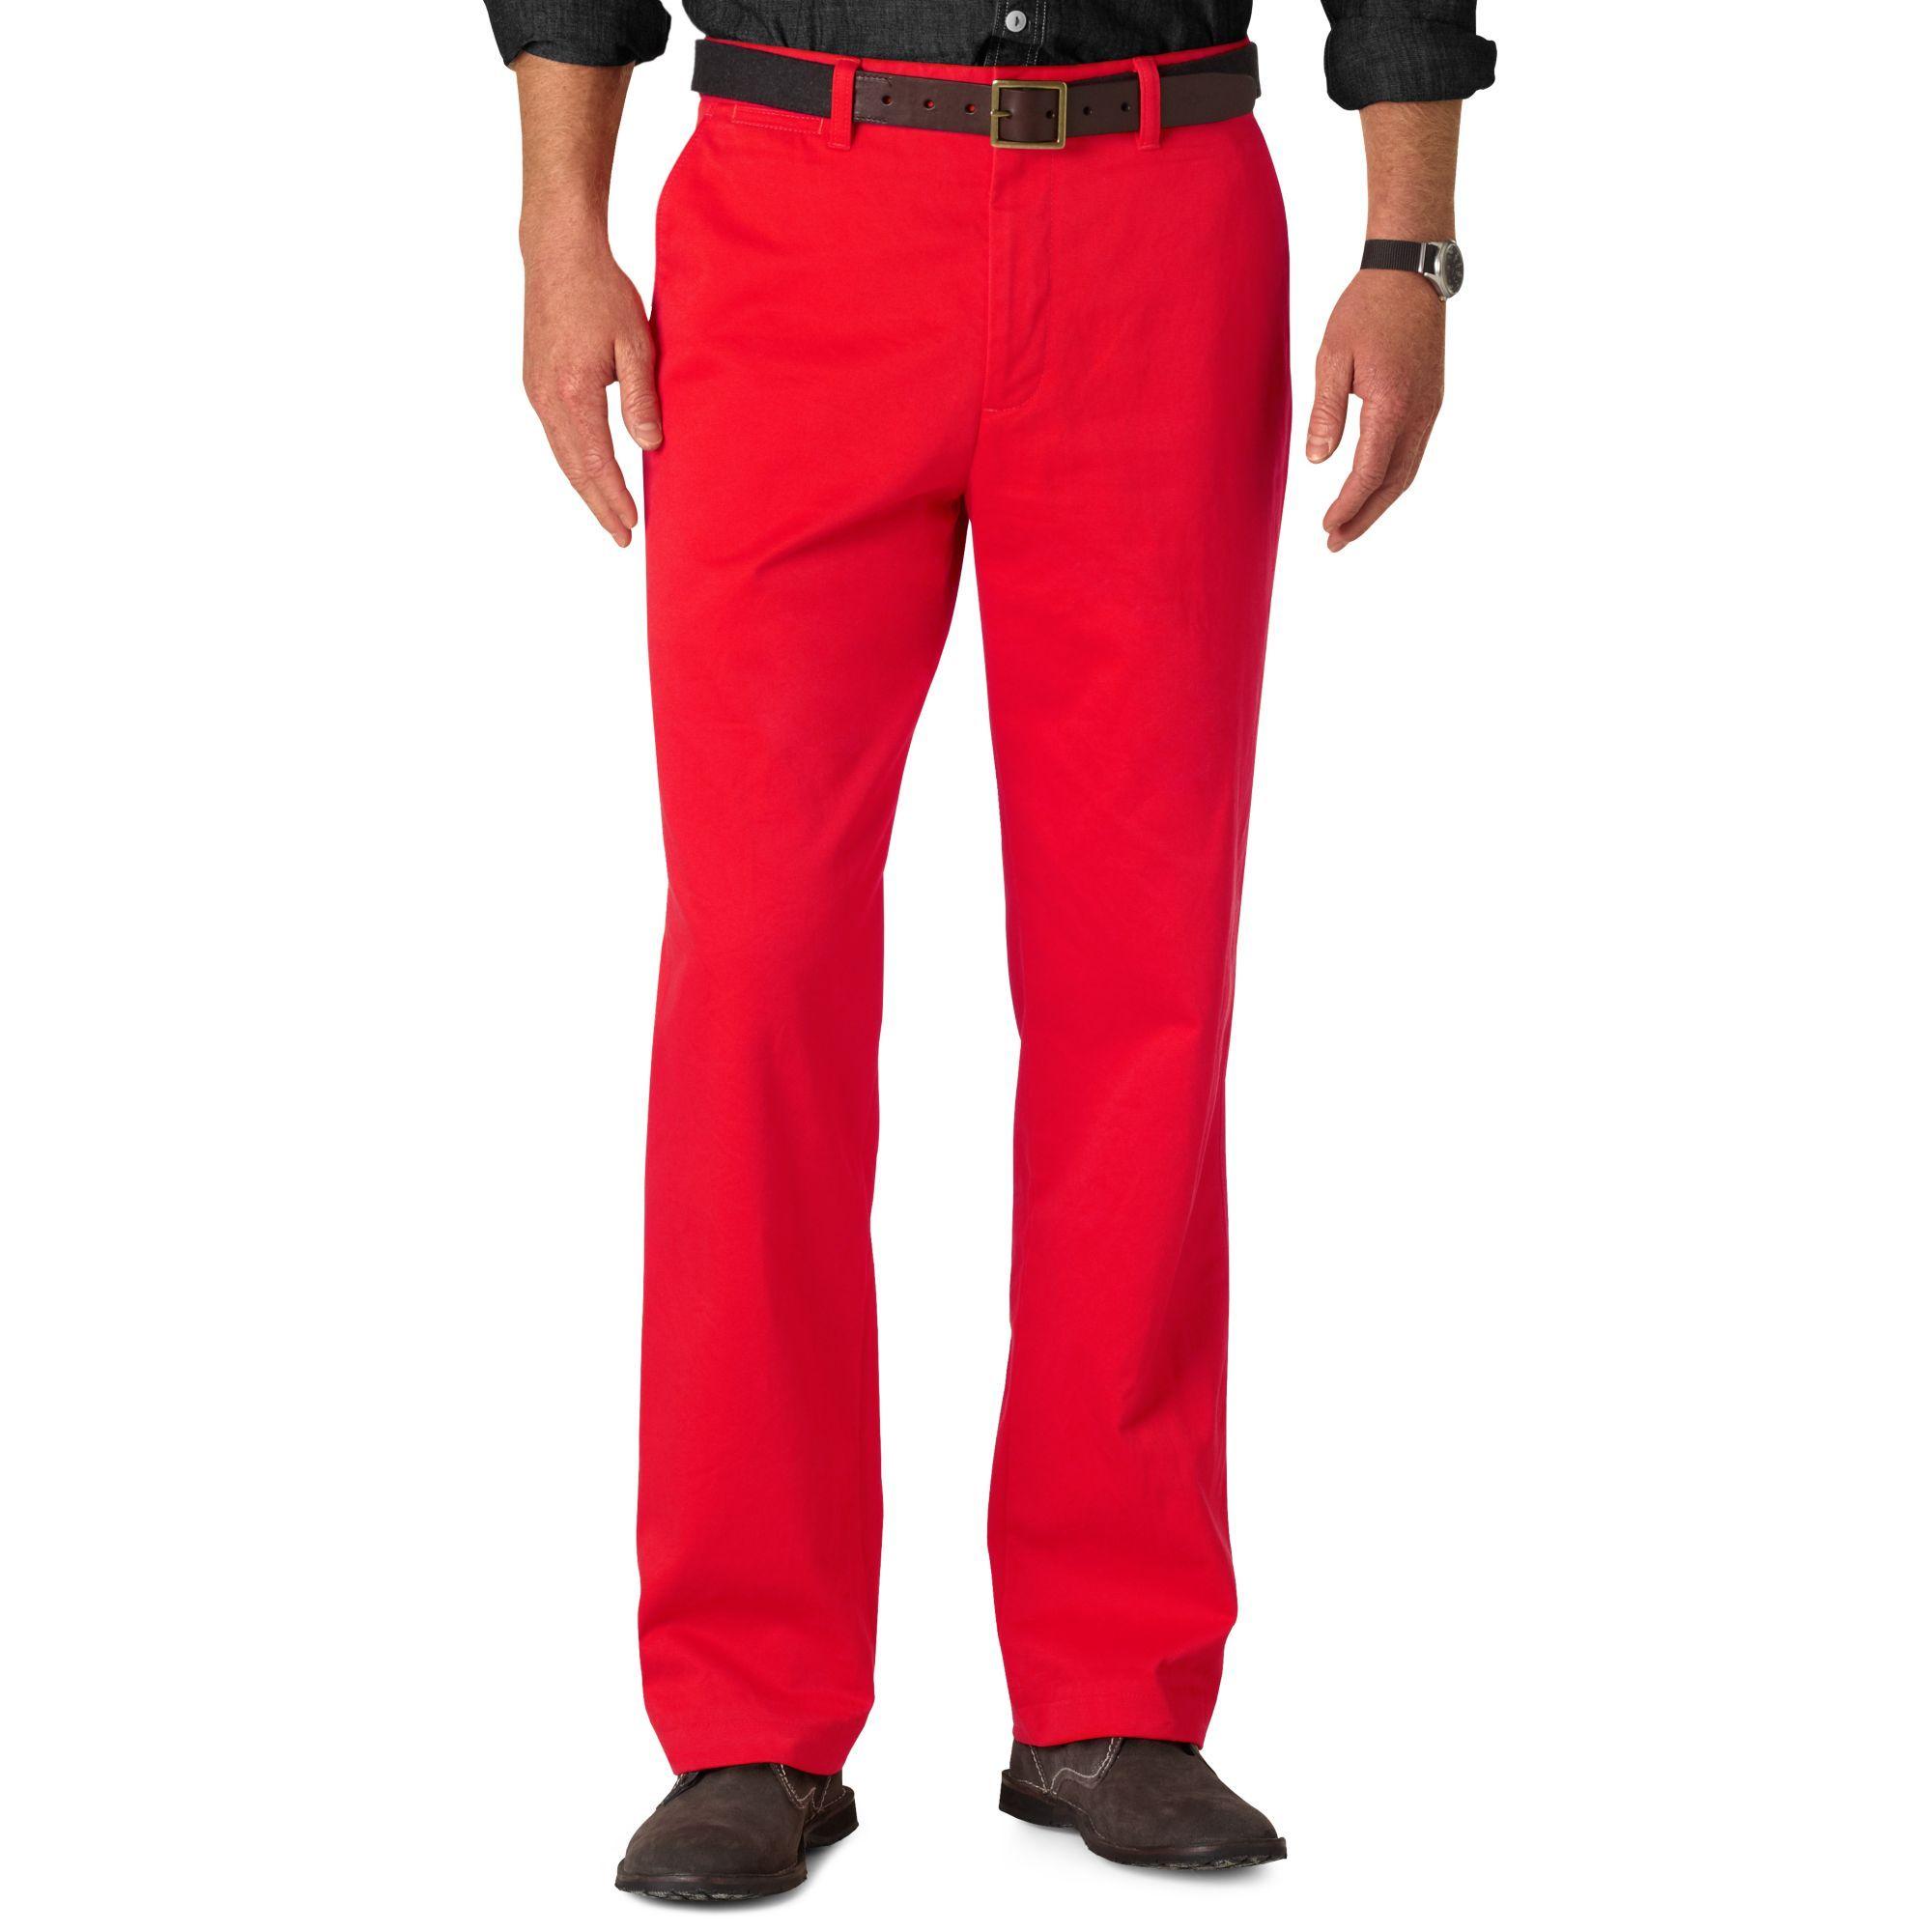 dockers-georgia-red-classic-fit-game-day-khaki-georgia-pants-product-1-13609135-794299350.jpeg (2000×2000)